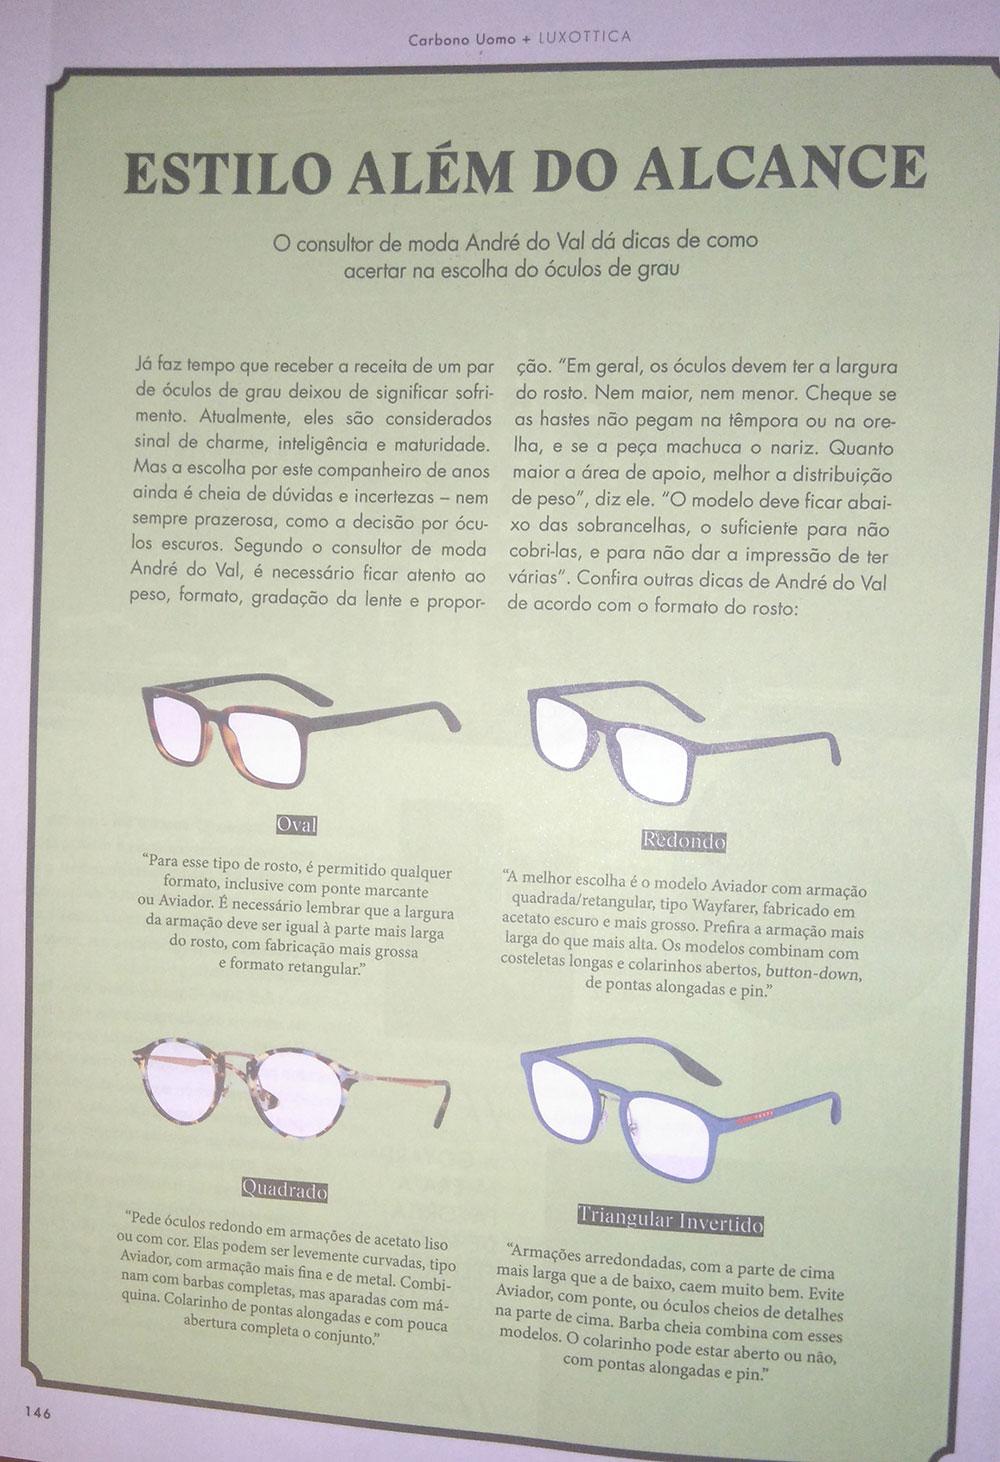 90f93828c21c1 Luxottica  FrameYourFace - Moda masculina, por André do Val